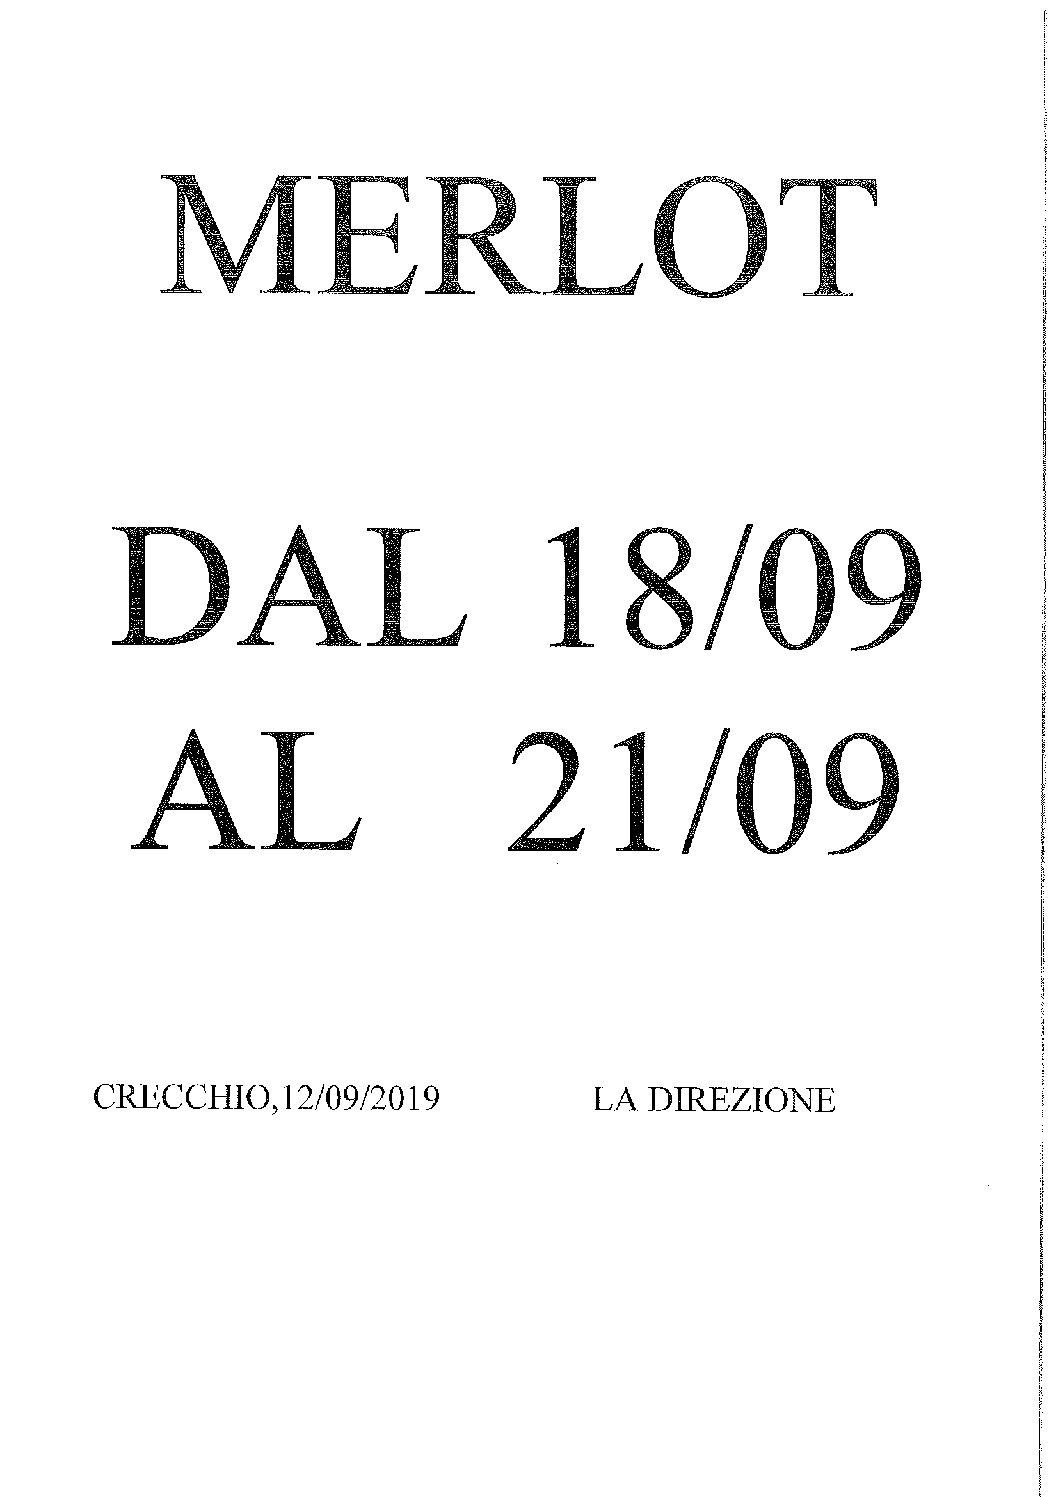 AVVISO RACCOLTA MERLOT